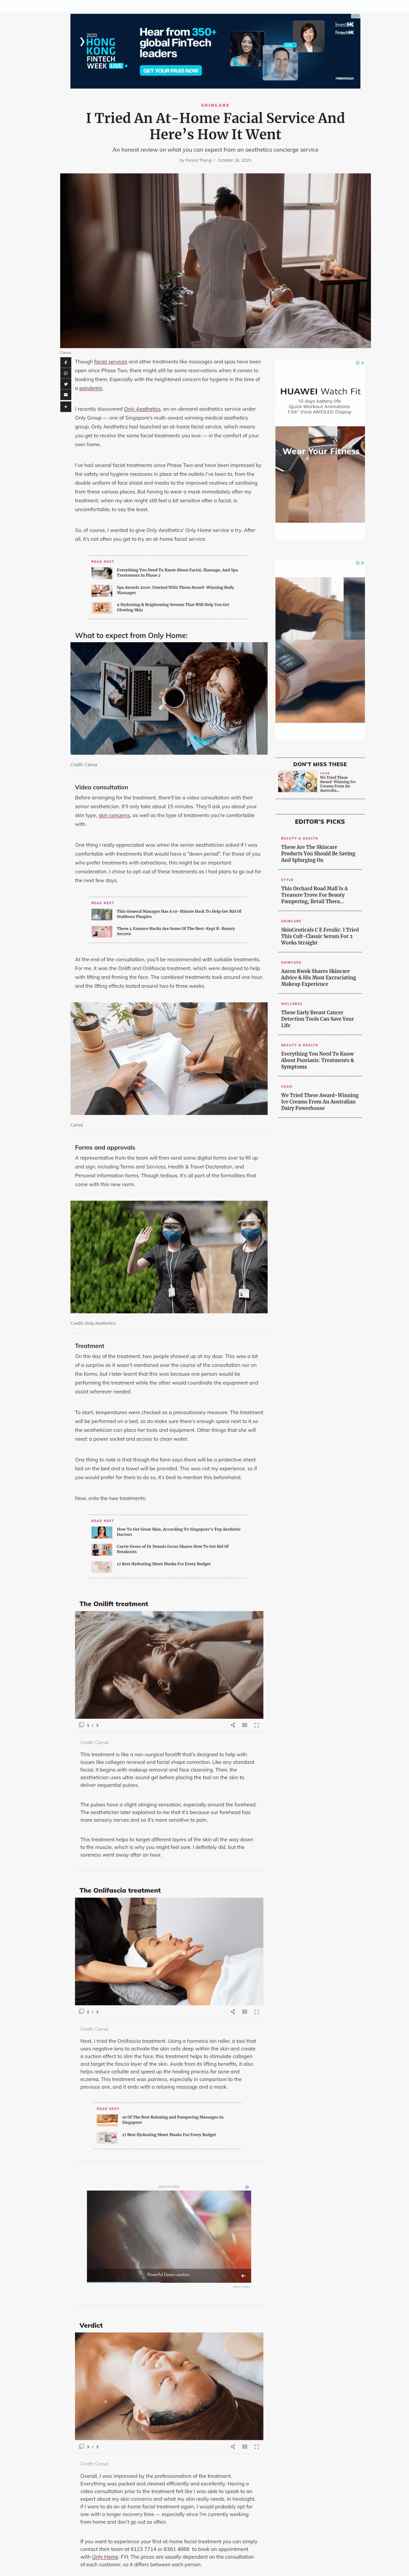 Singapore Women's Weekly